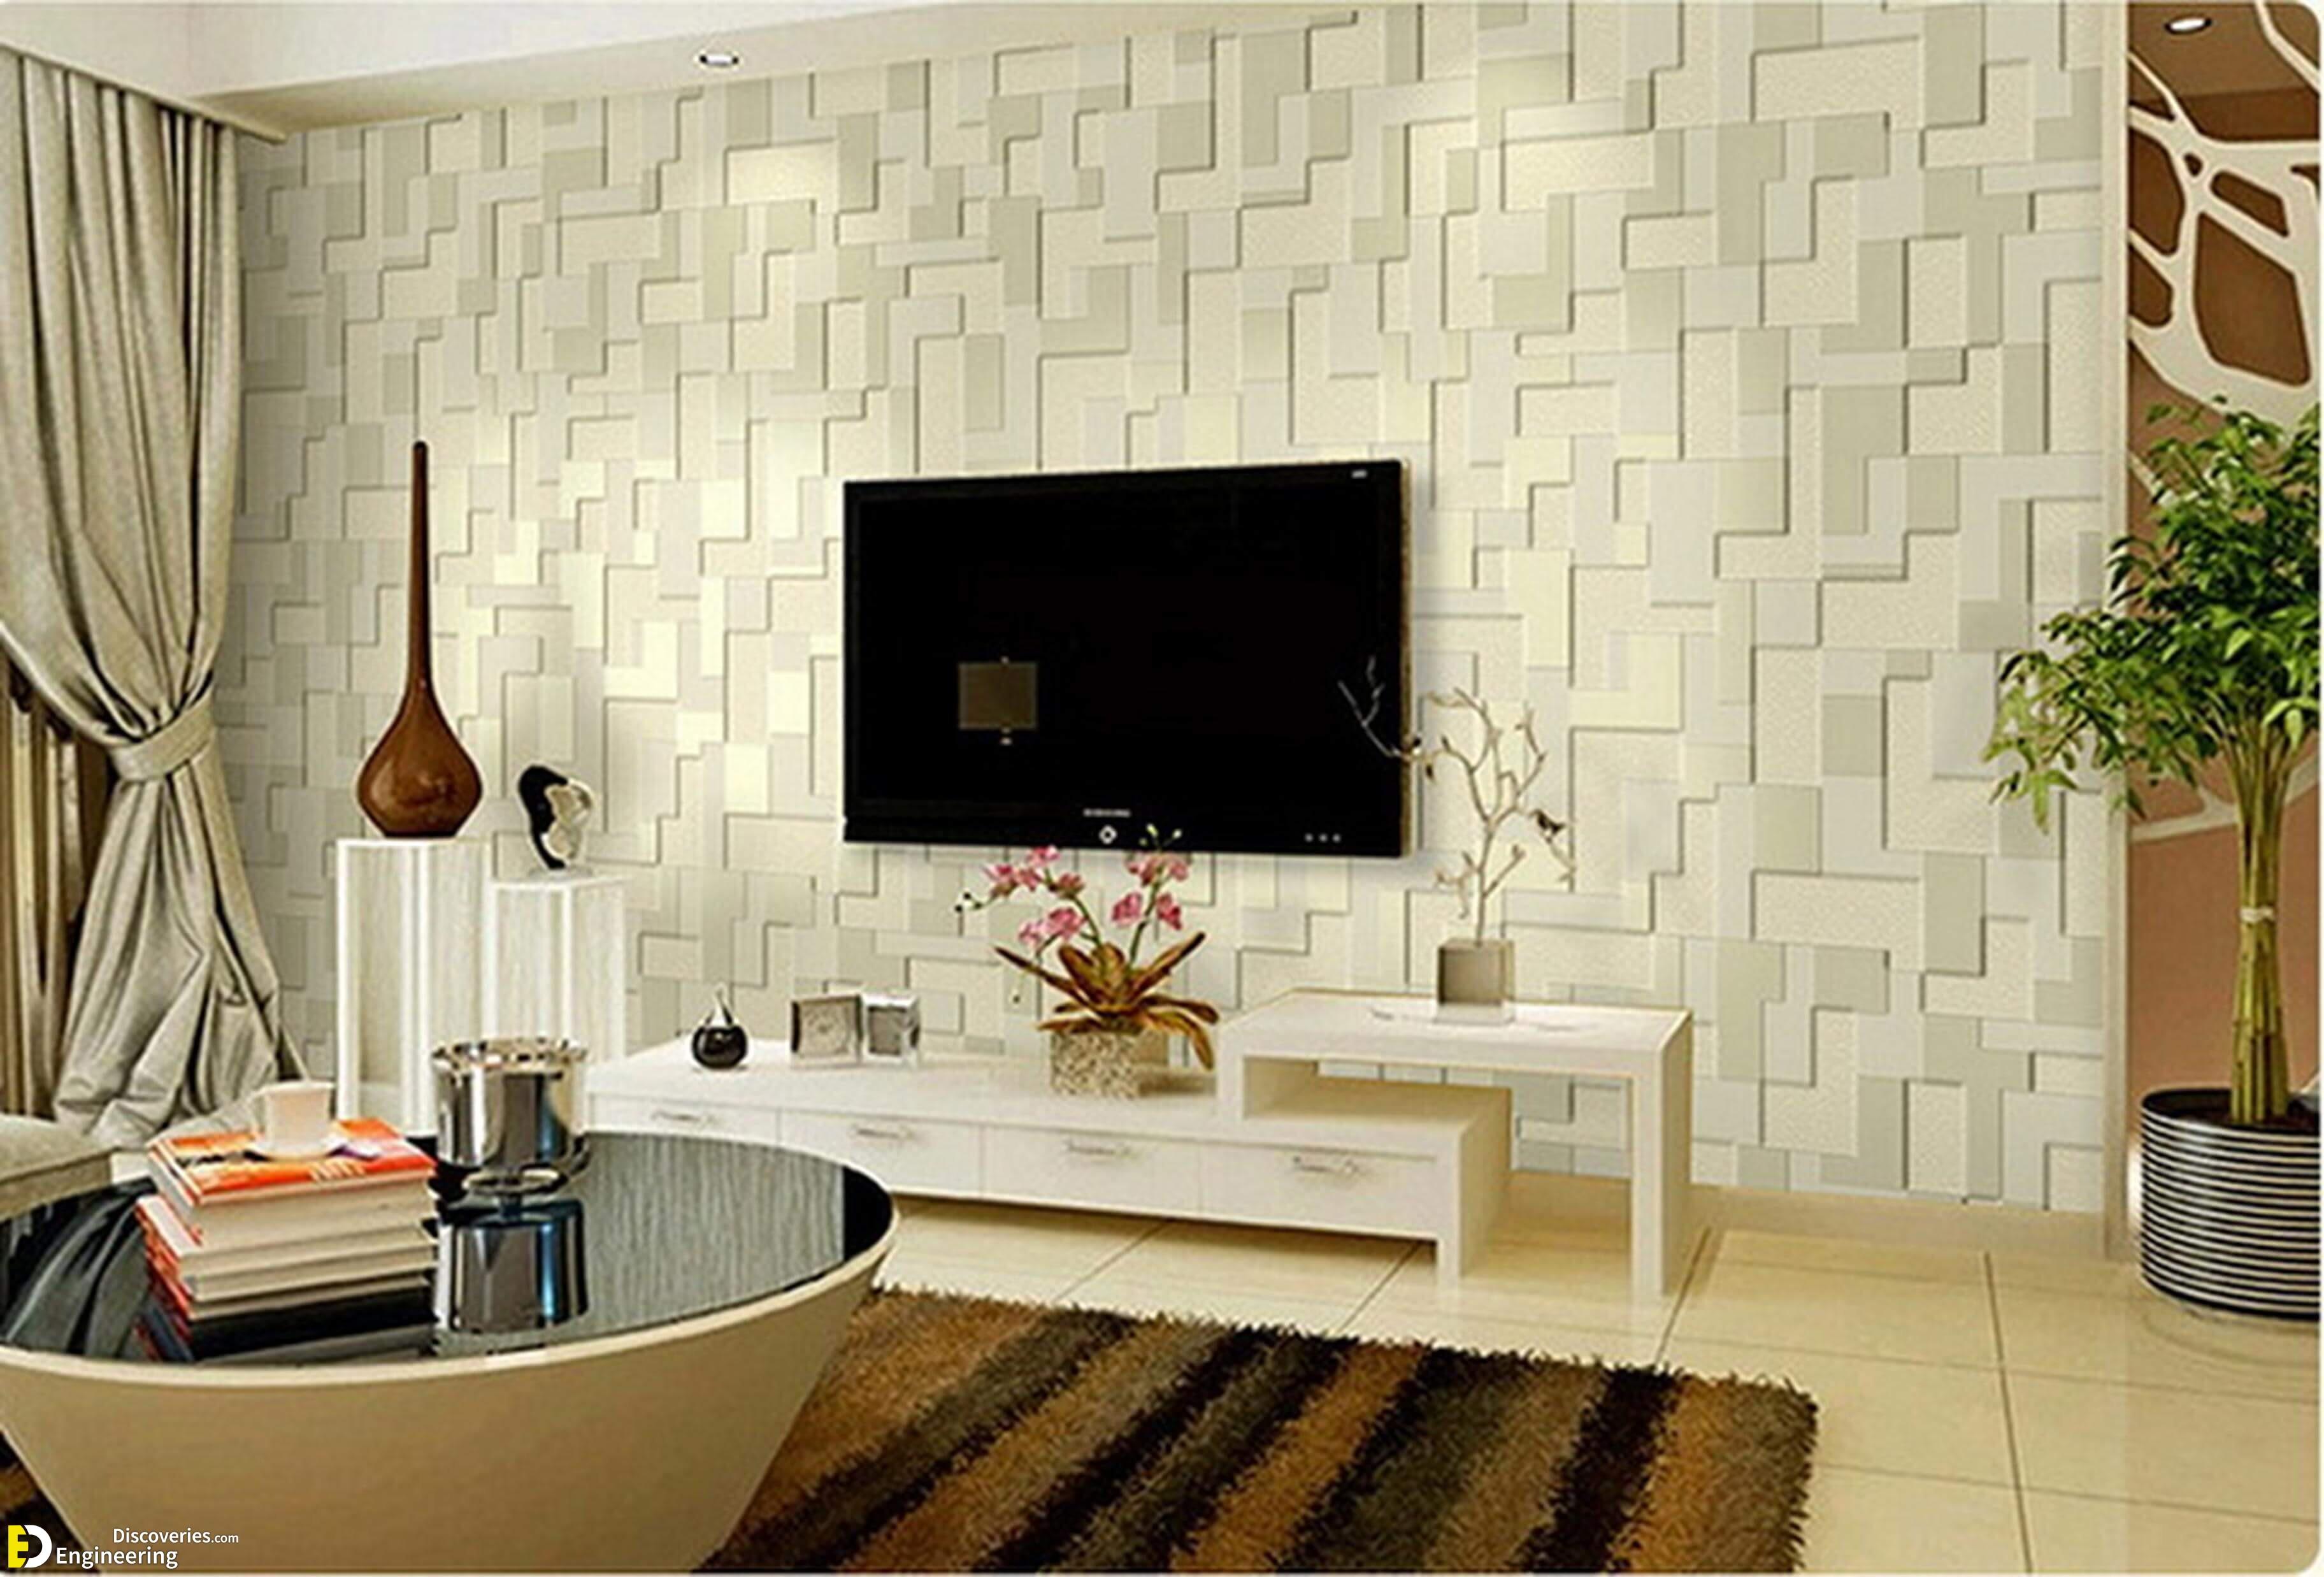 Modern 3d Wallpaper Design Ideas That Looks Absolute Real